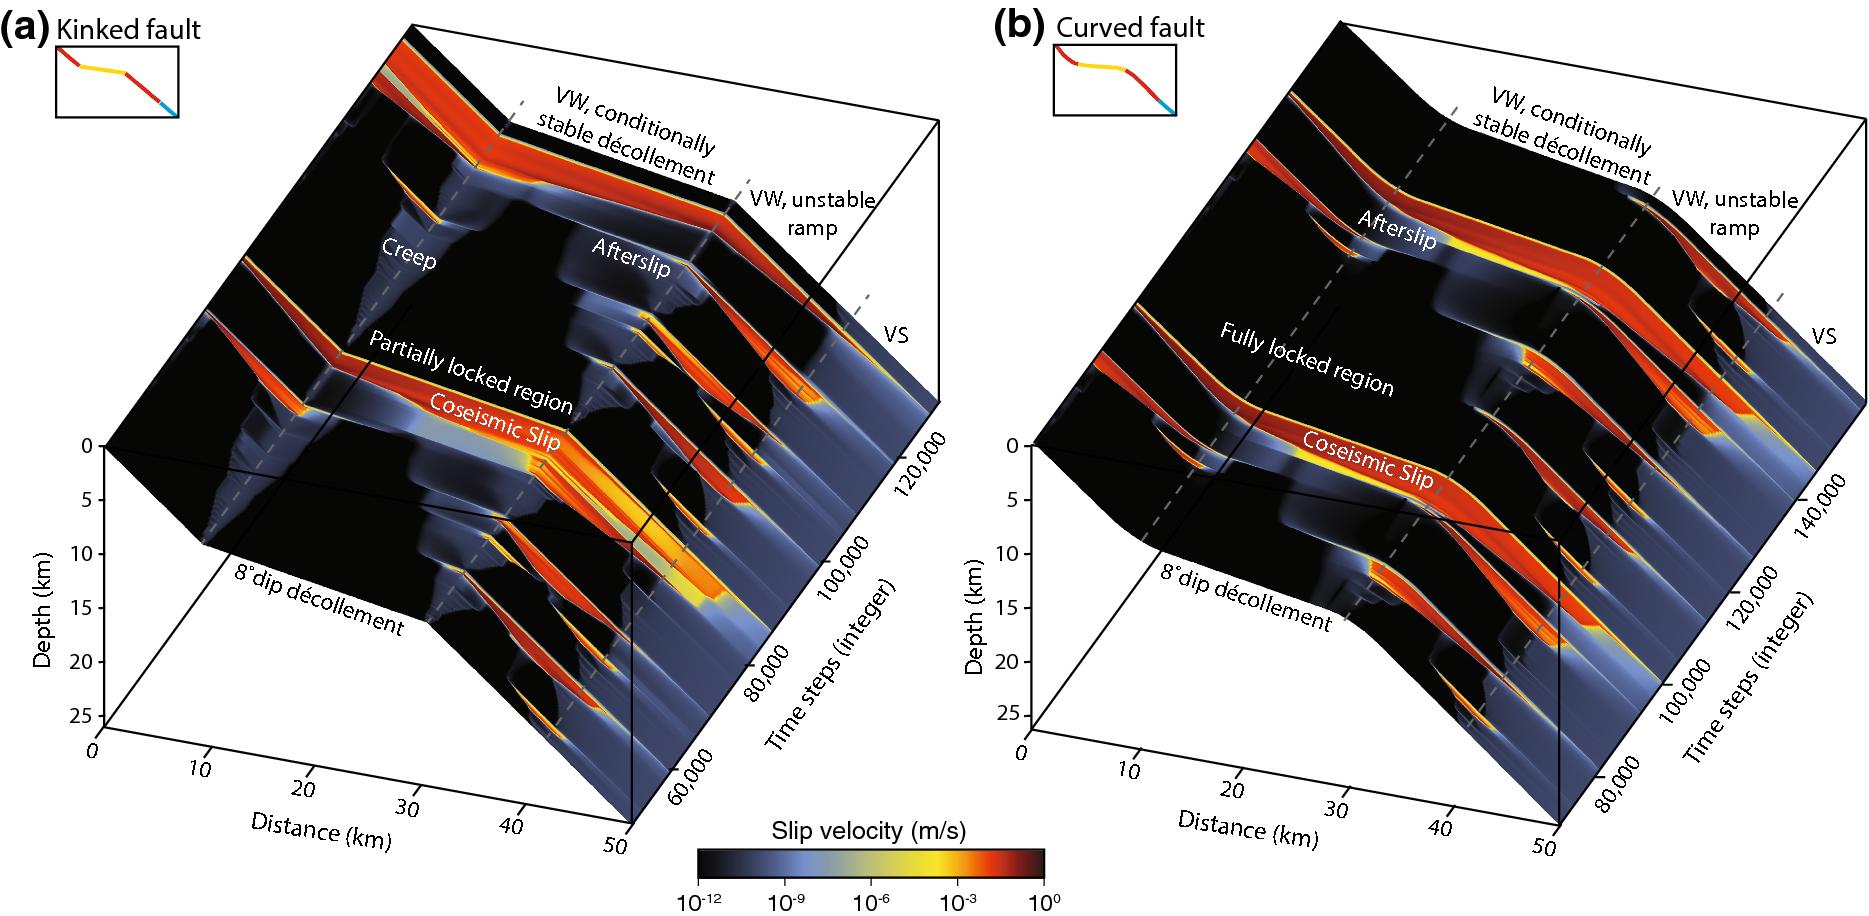 Physics-Based Scenario of Earthquake Cycles on the Ventura